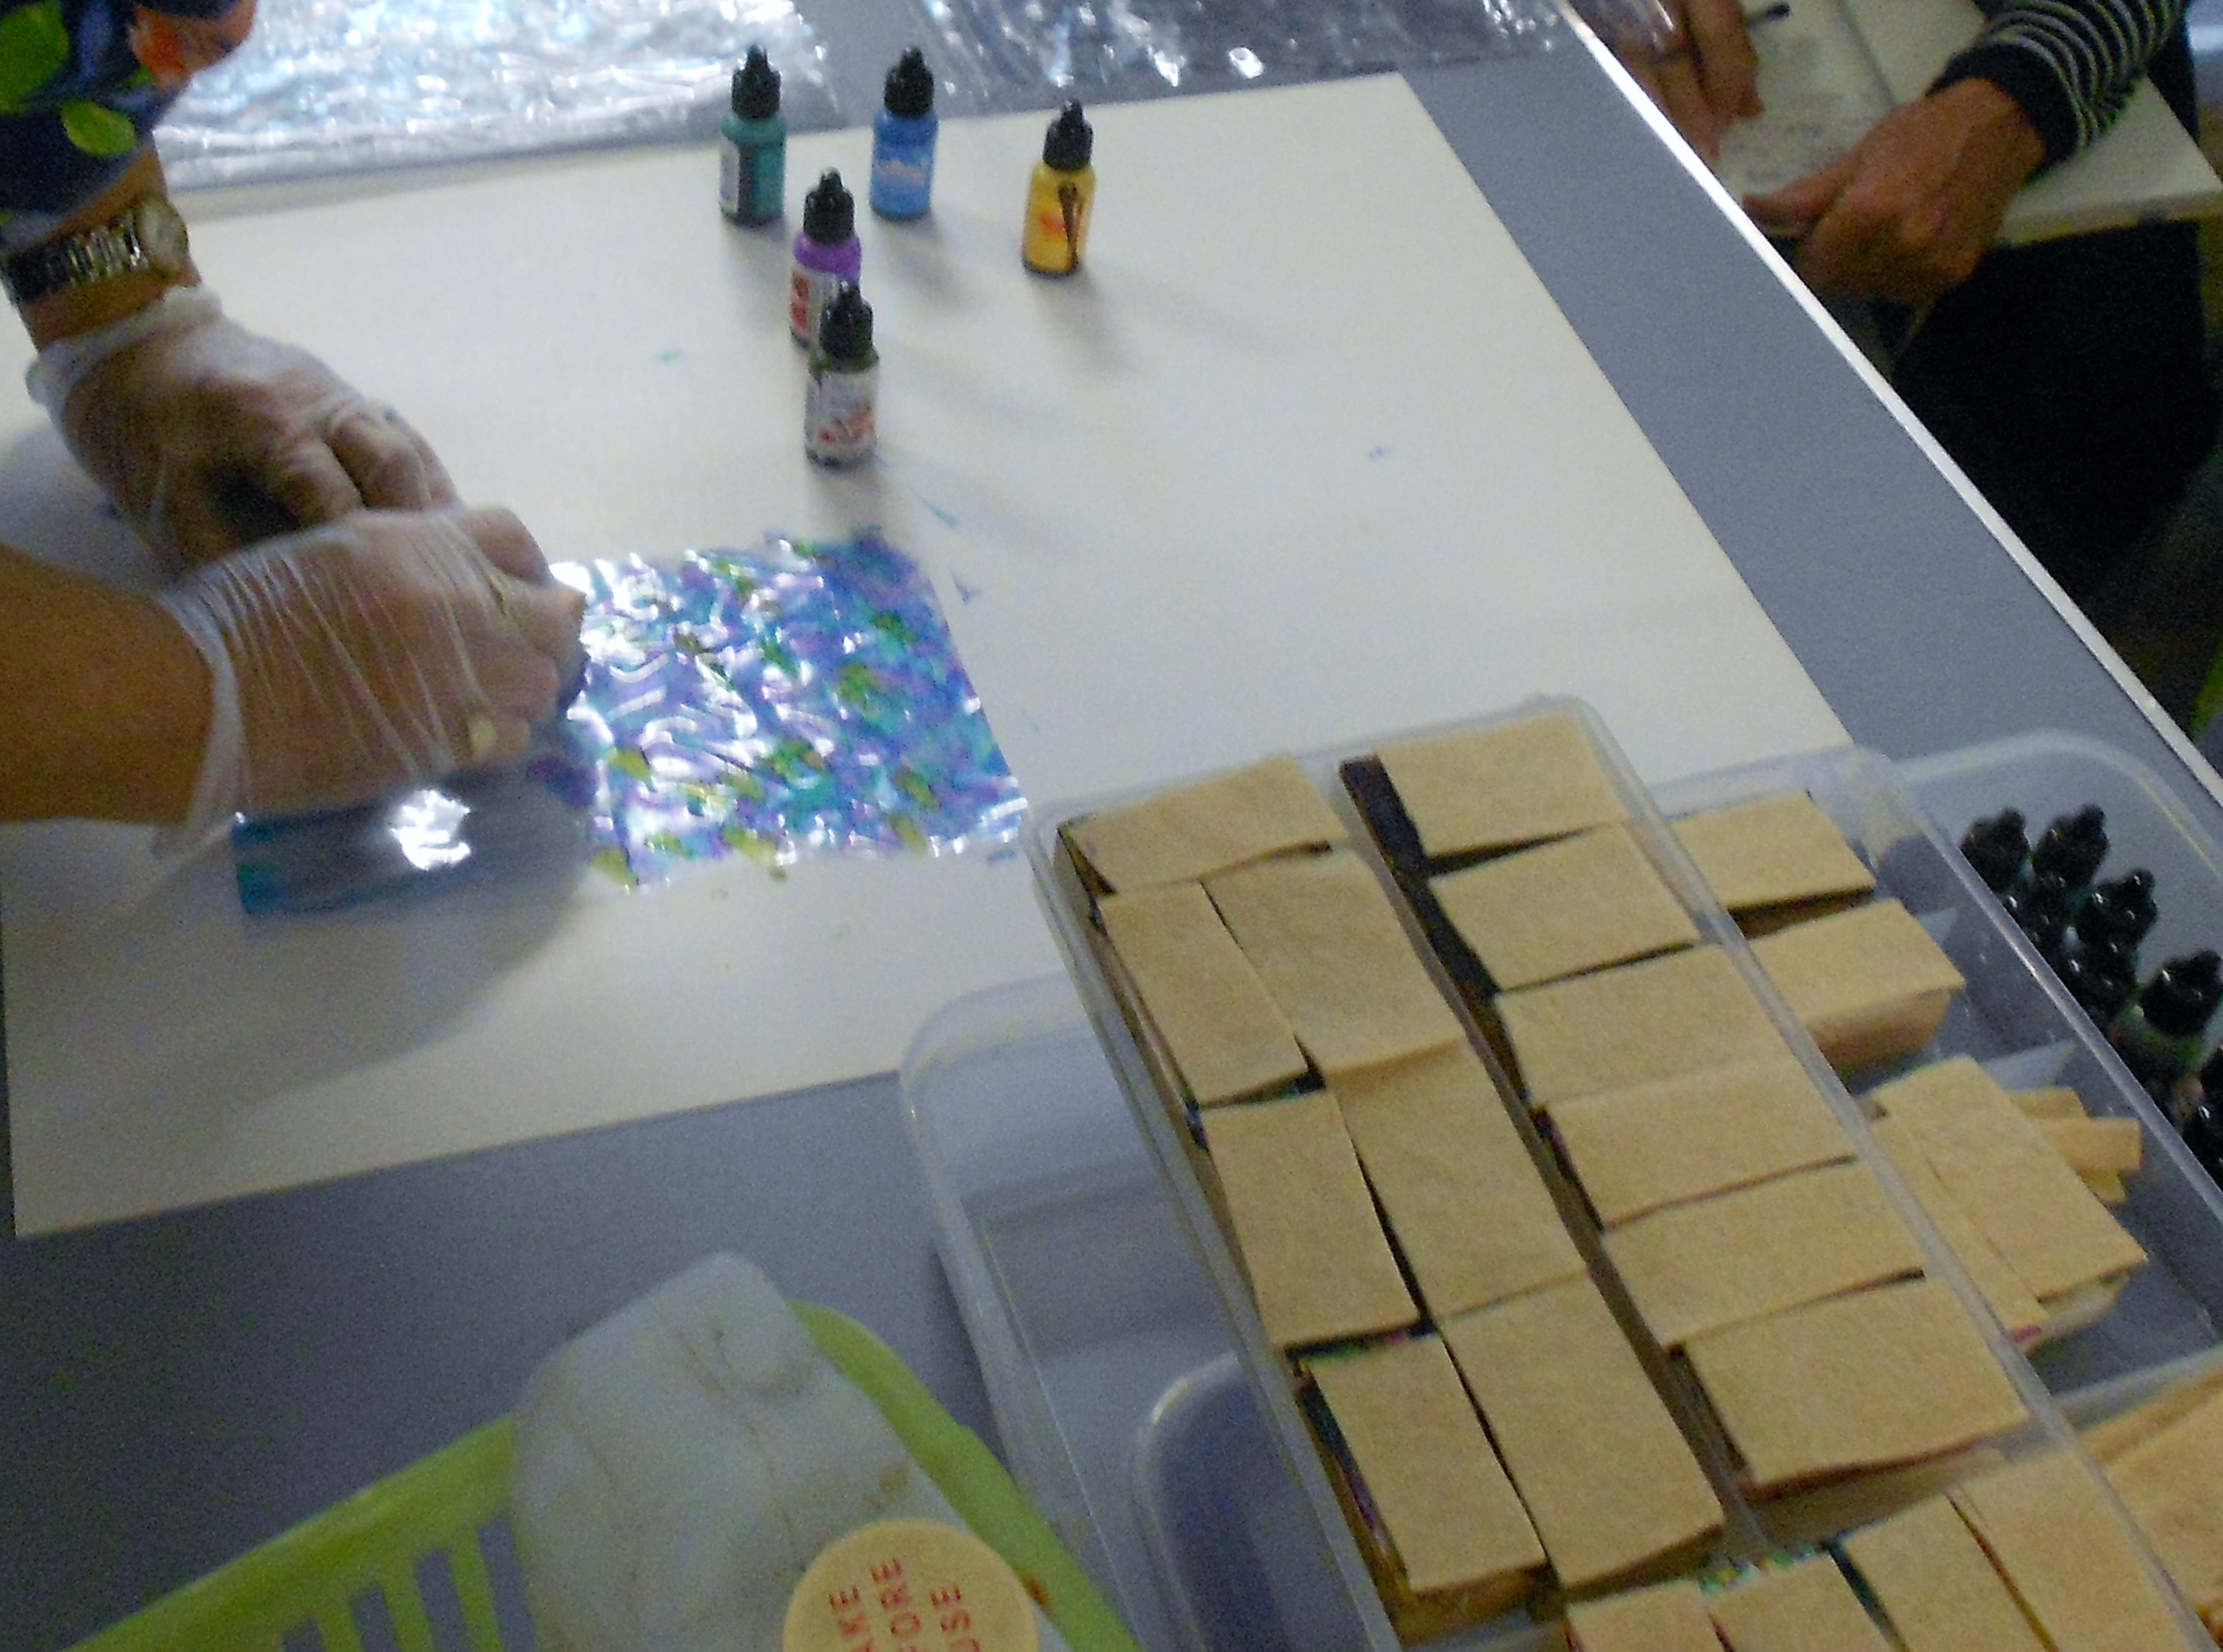 Sue Sercombe tote bag workshop 18.08.18